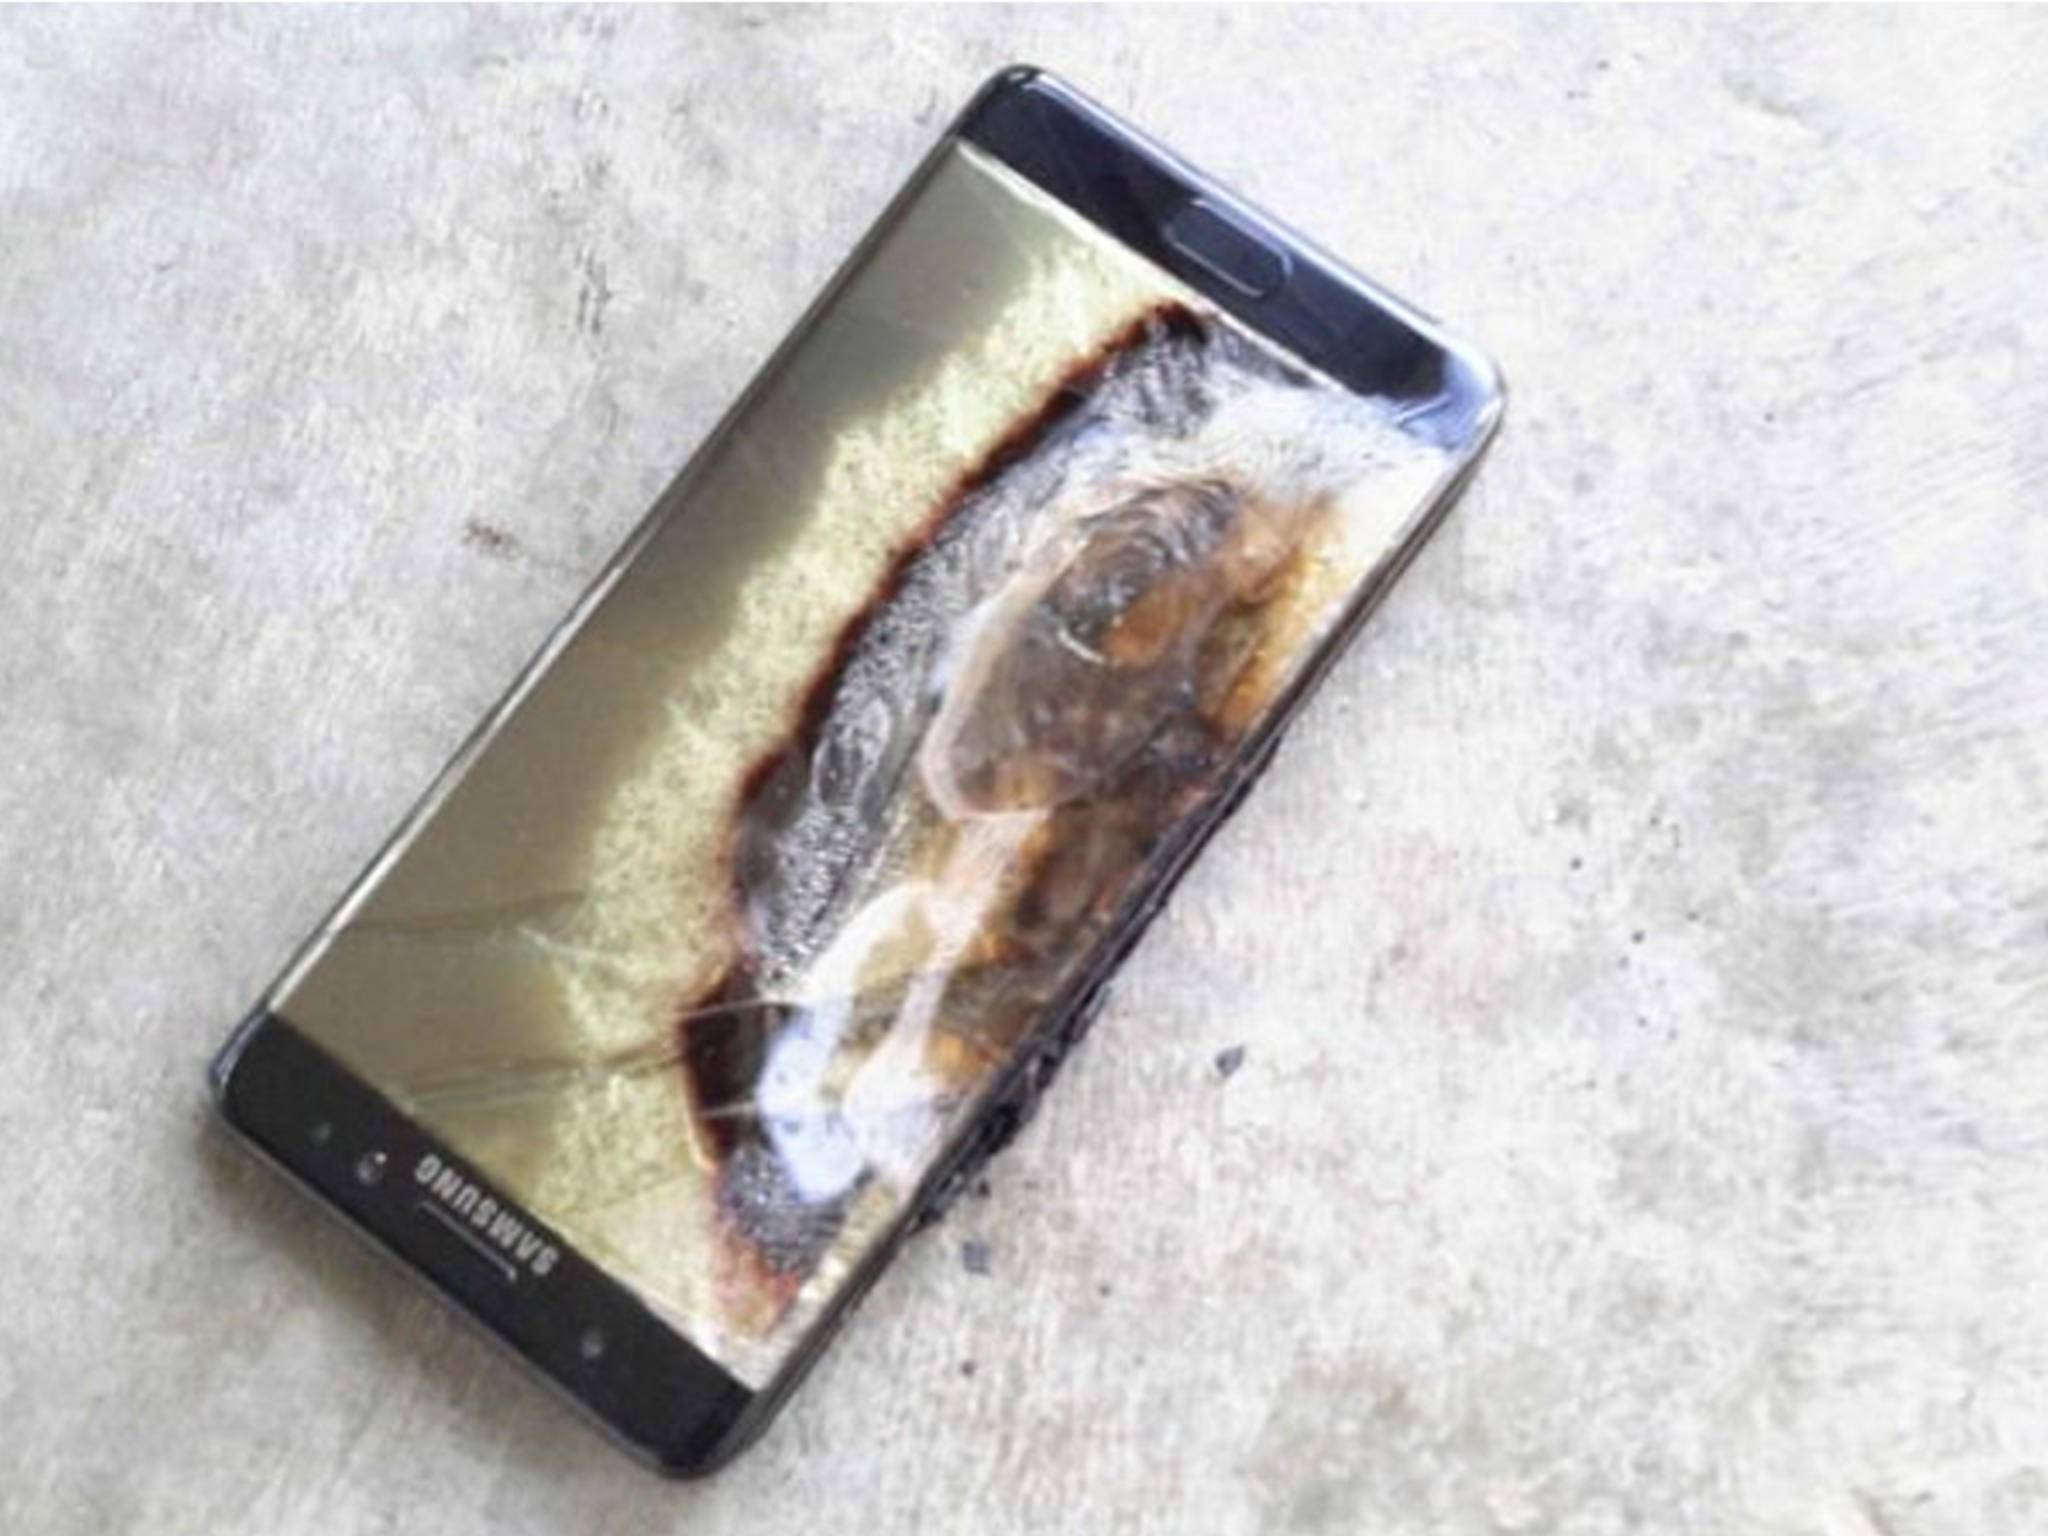 Warum explodieren Smartphone-Akkus?